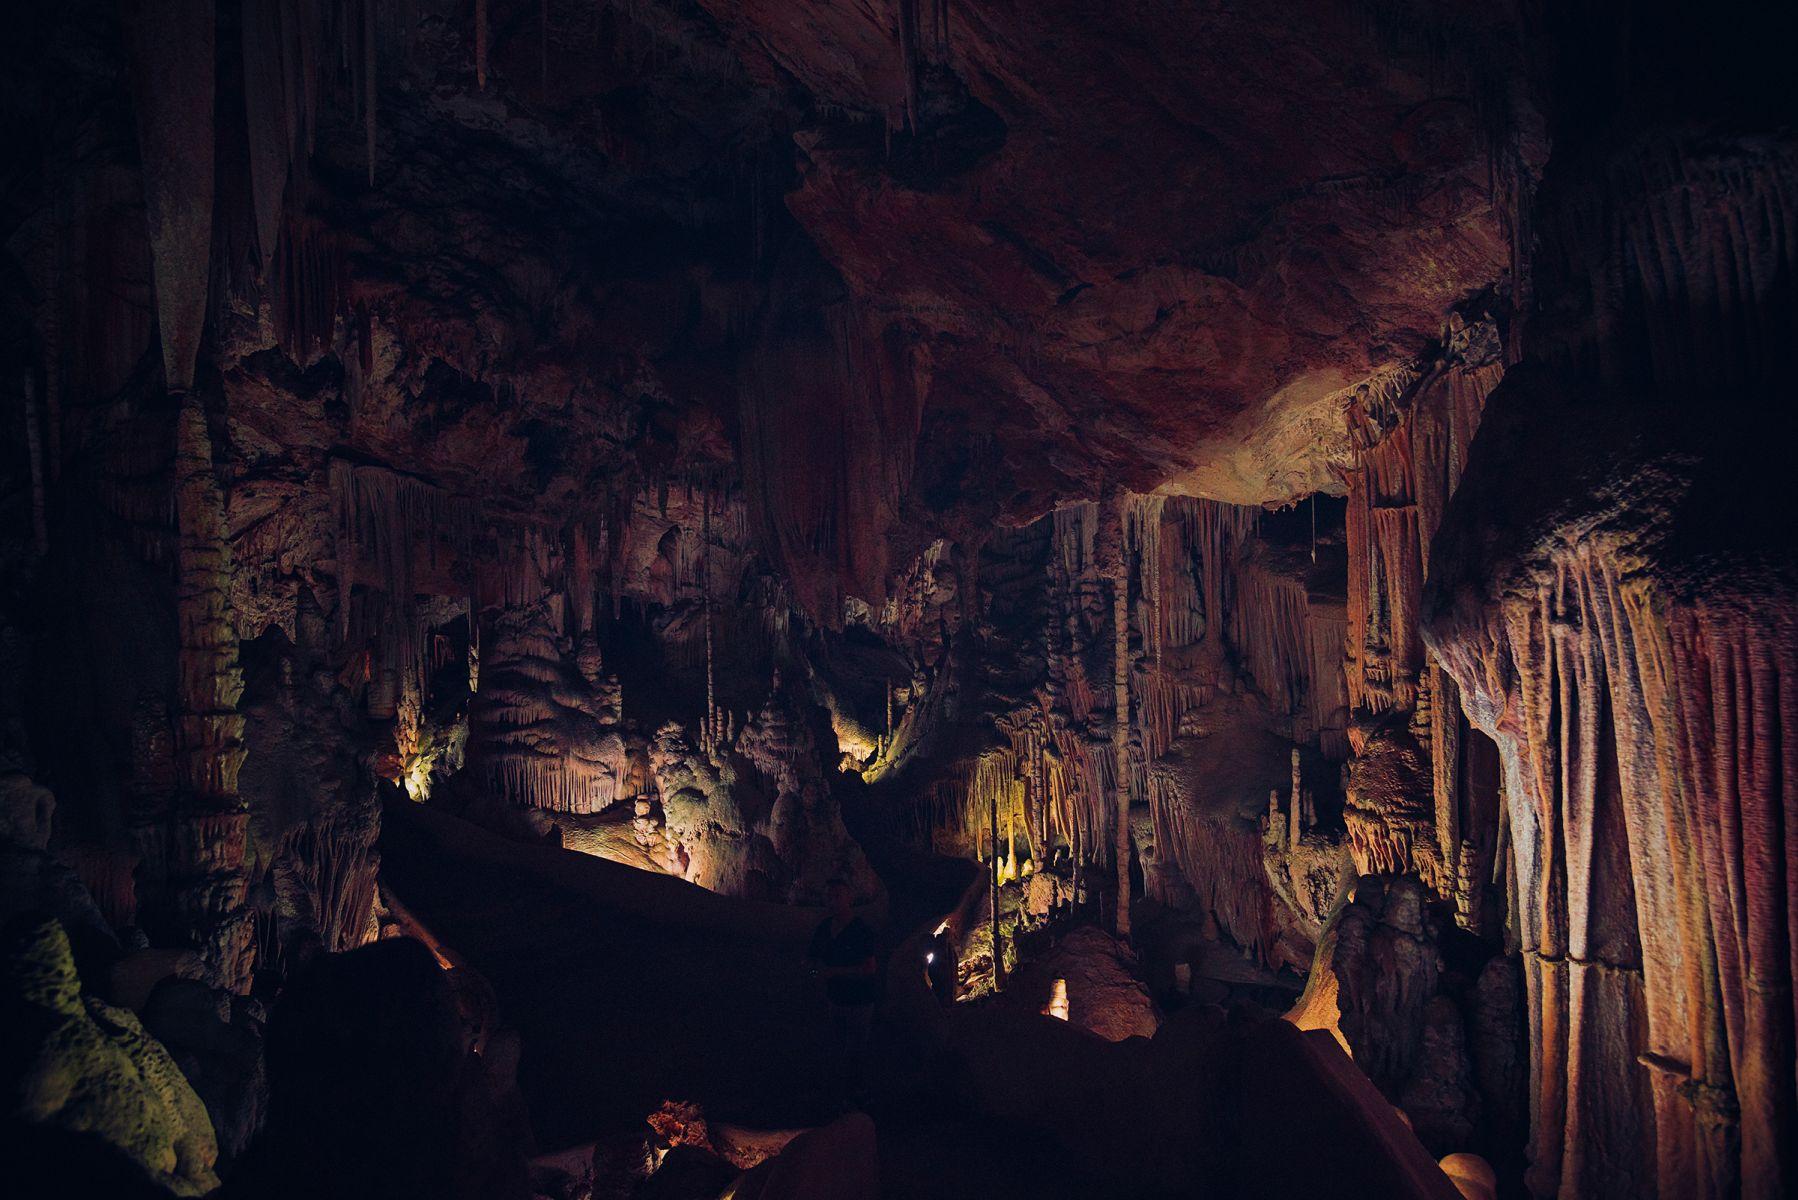 cave_FRK3328_8bit_srgb_CMS